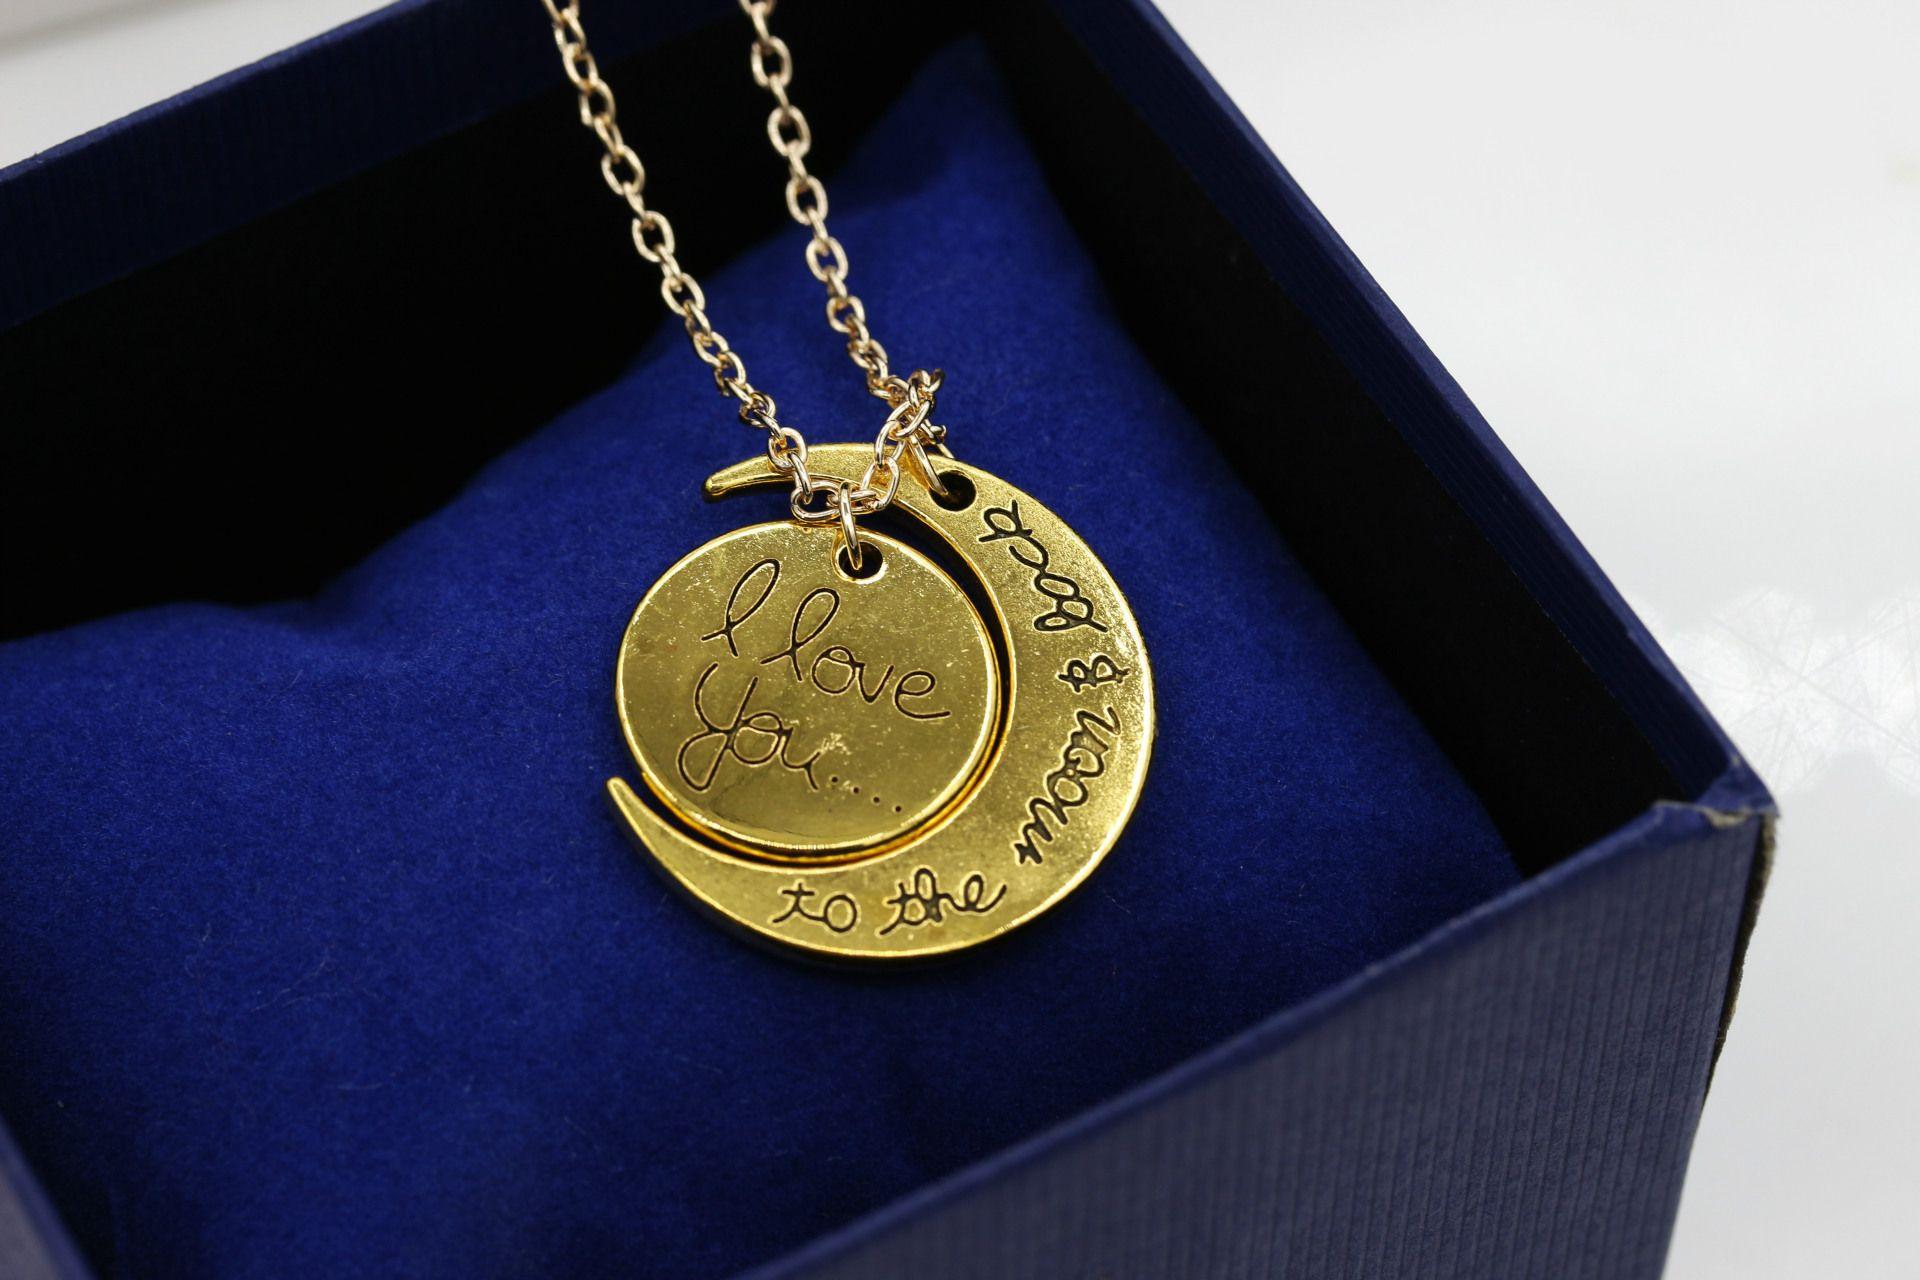 2 cores eu te amo para a lua e volta colar new hot pingente colares de ouro e prata